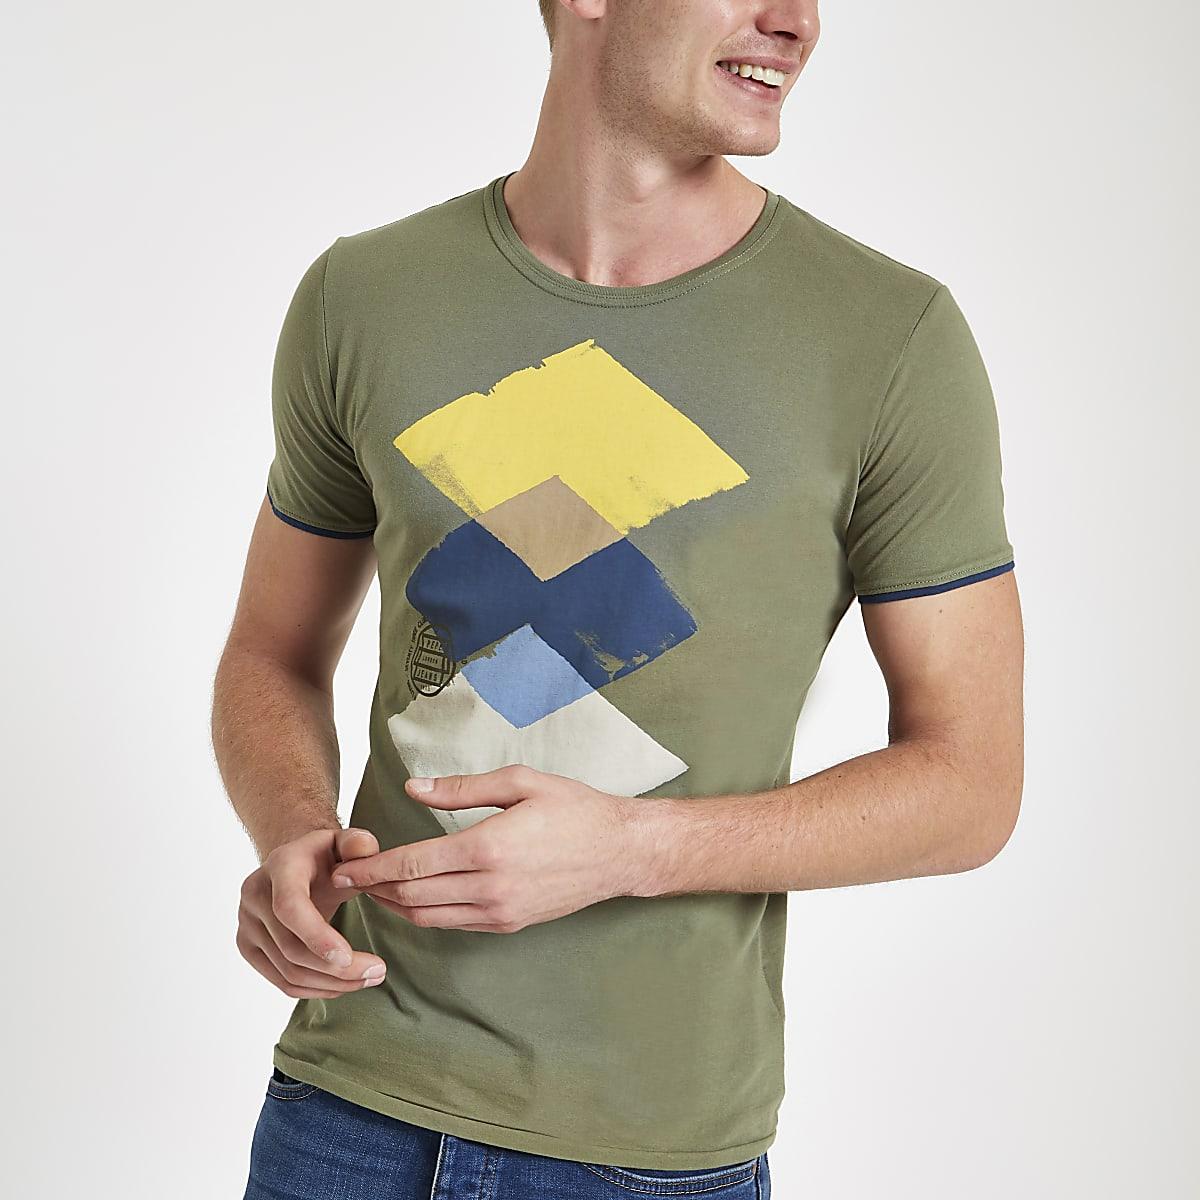 4e74d3d878 Pepe Jeans green universe print T-shirt - T-shirts - T-Shirts   Vests - men